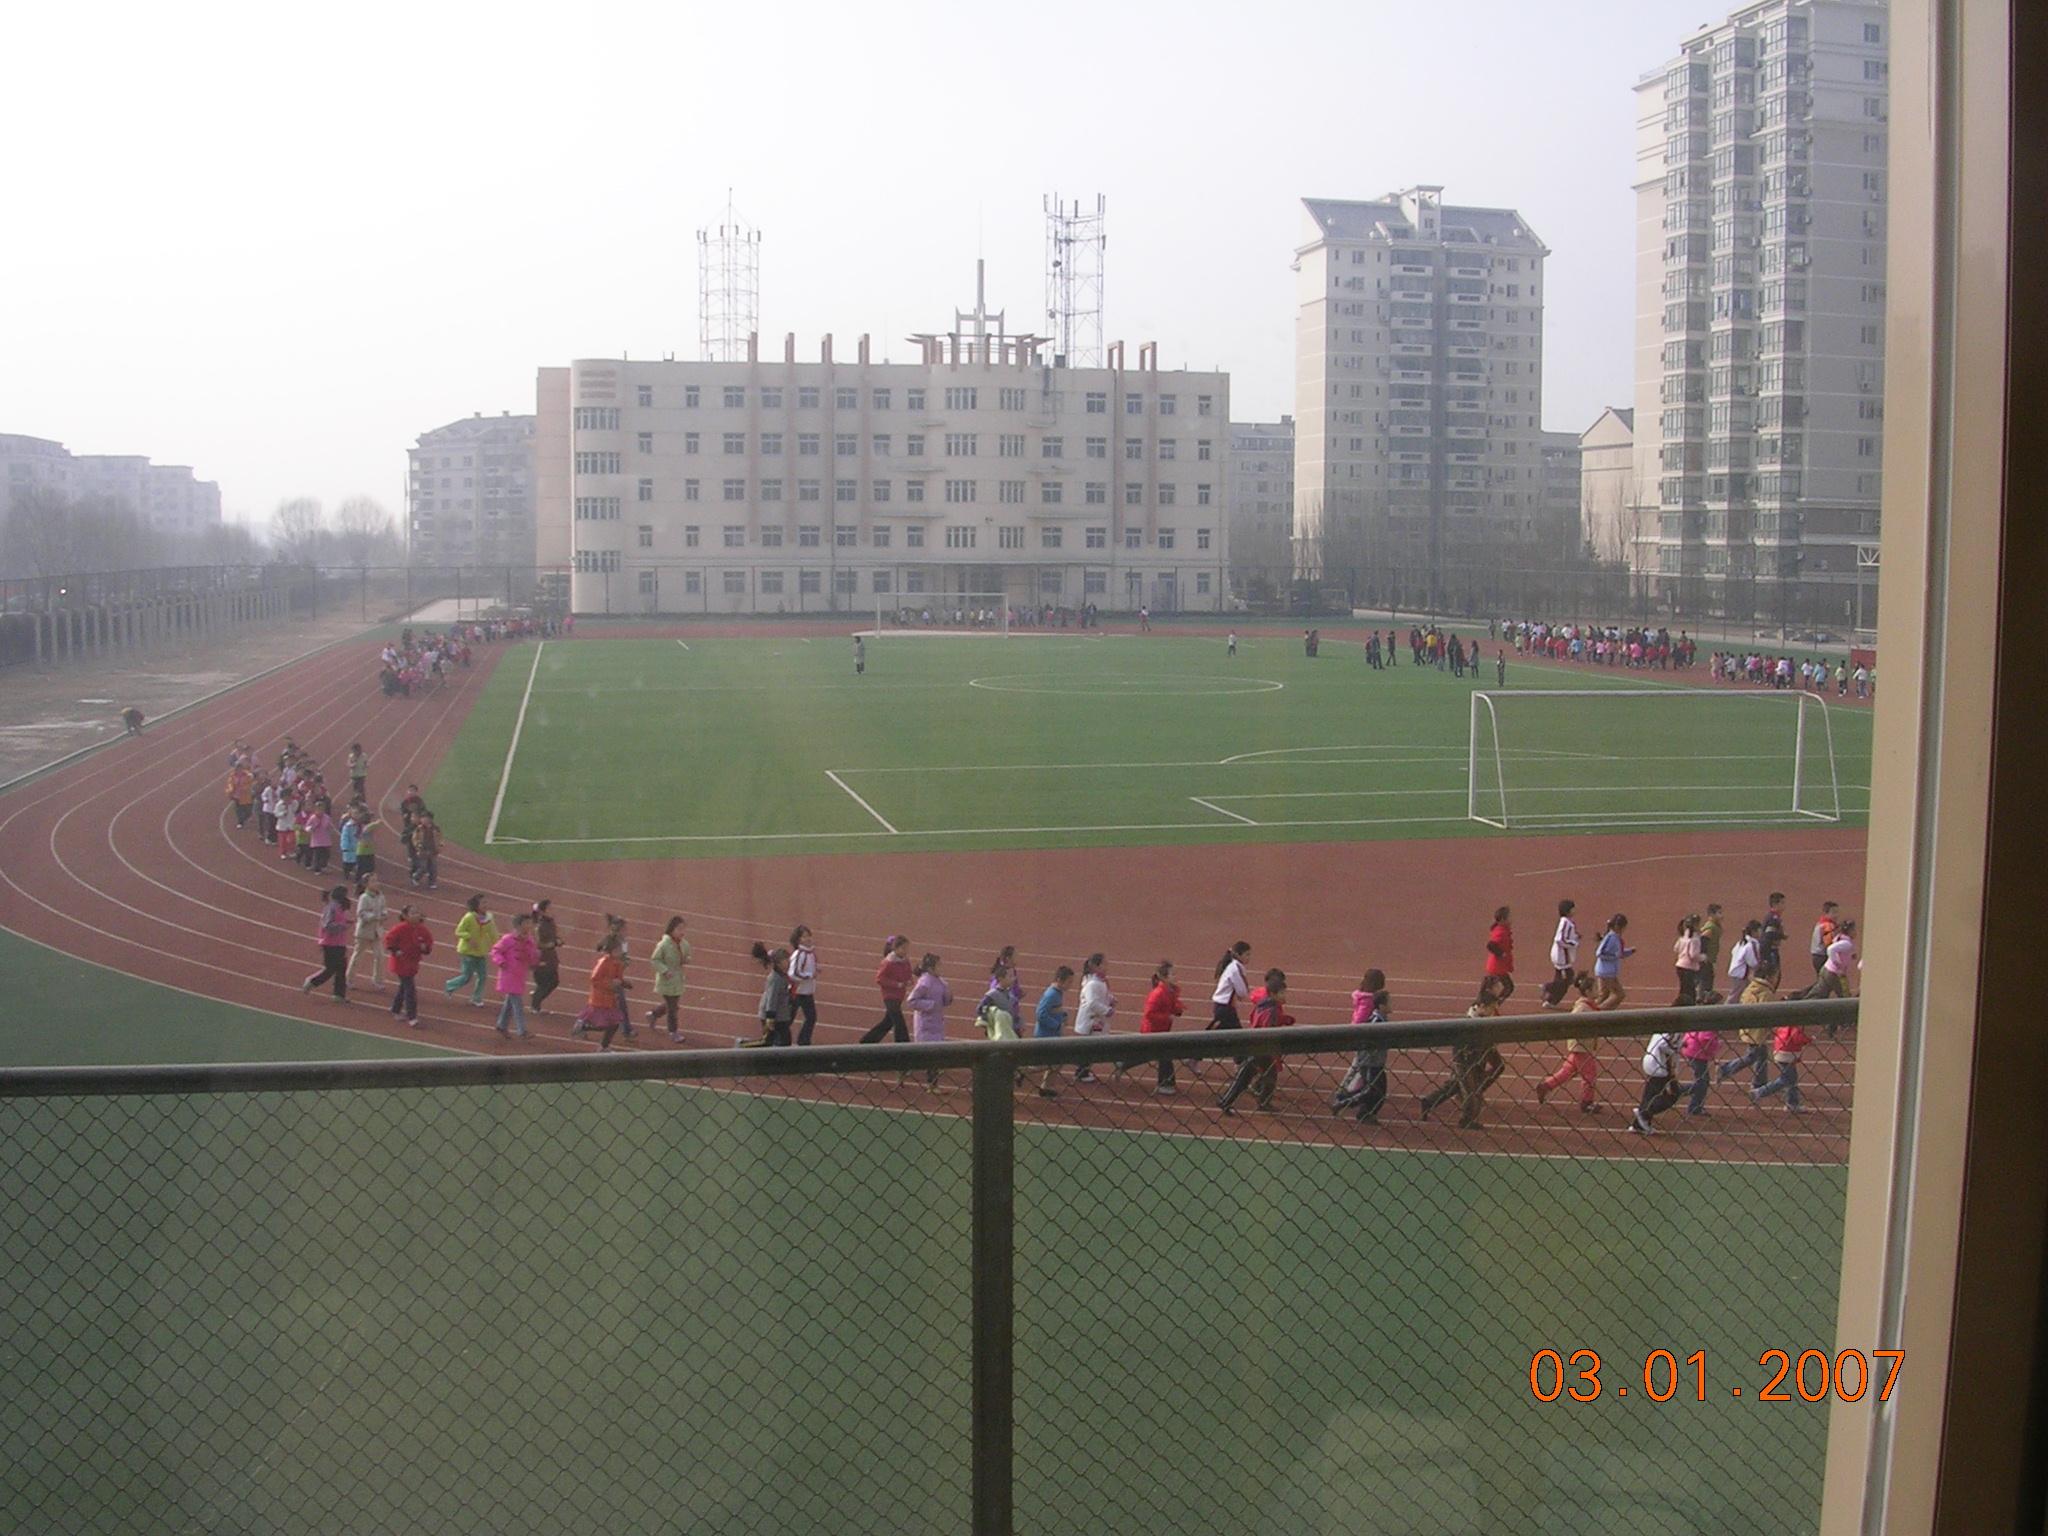 2007-3-02A 002.jpg